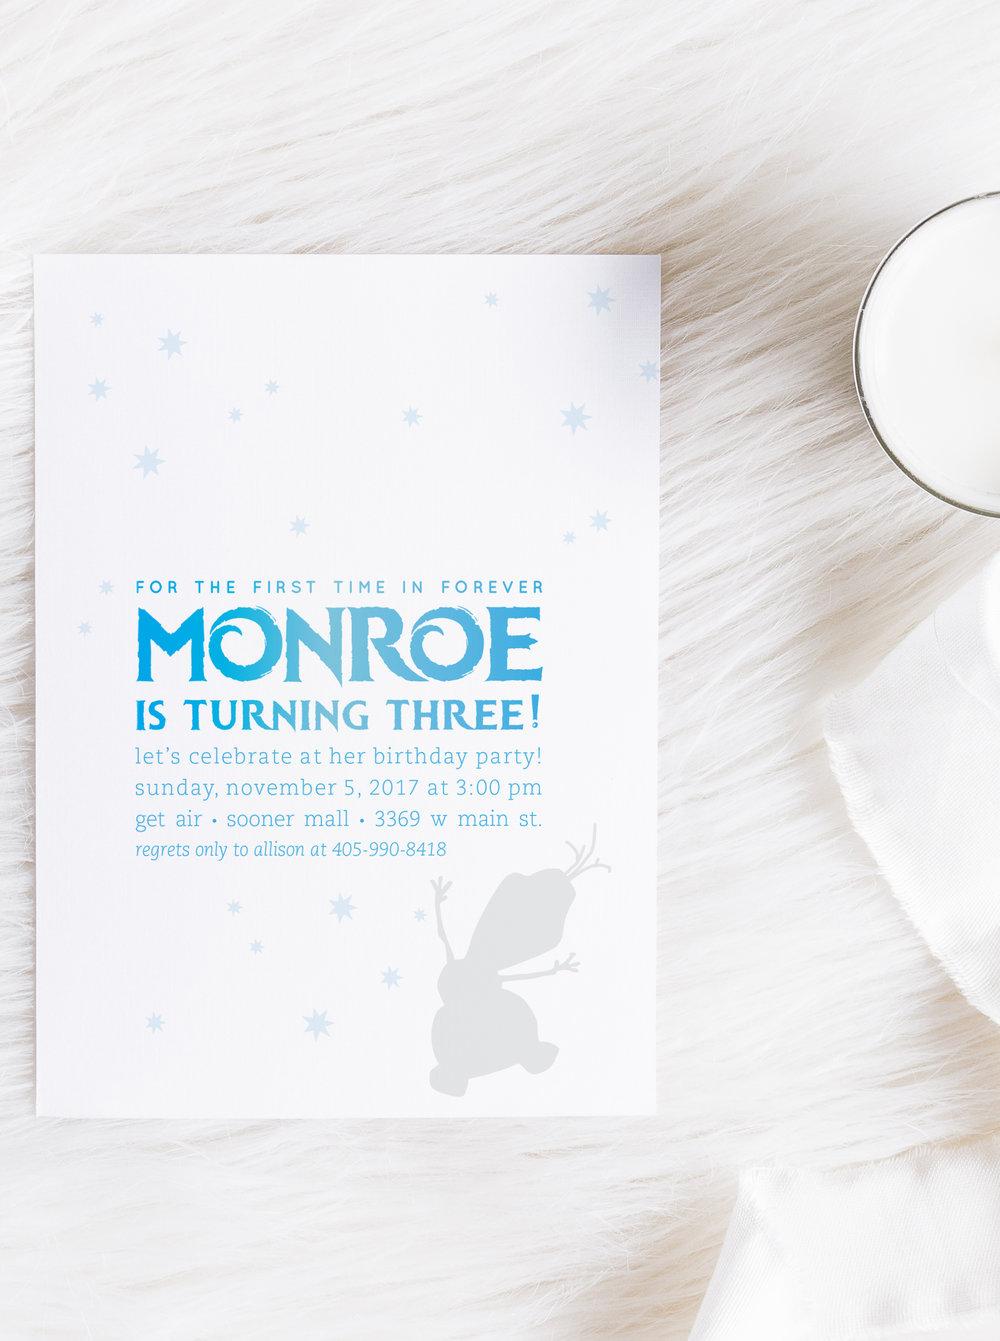 monroe_3rdbirthdayparty_invitation.jpg